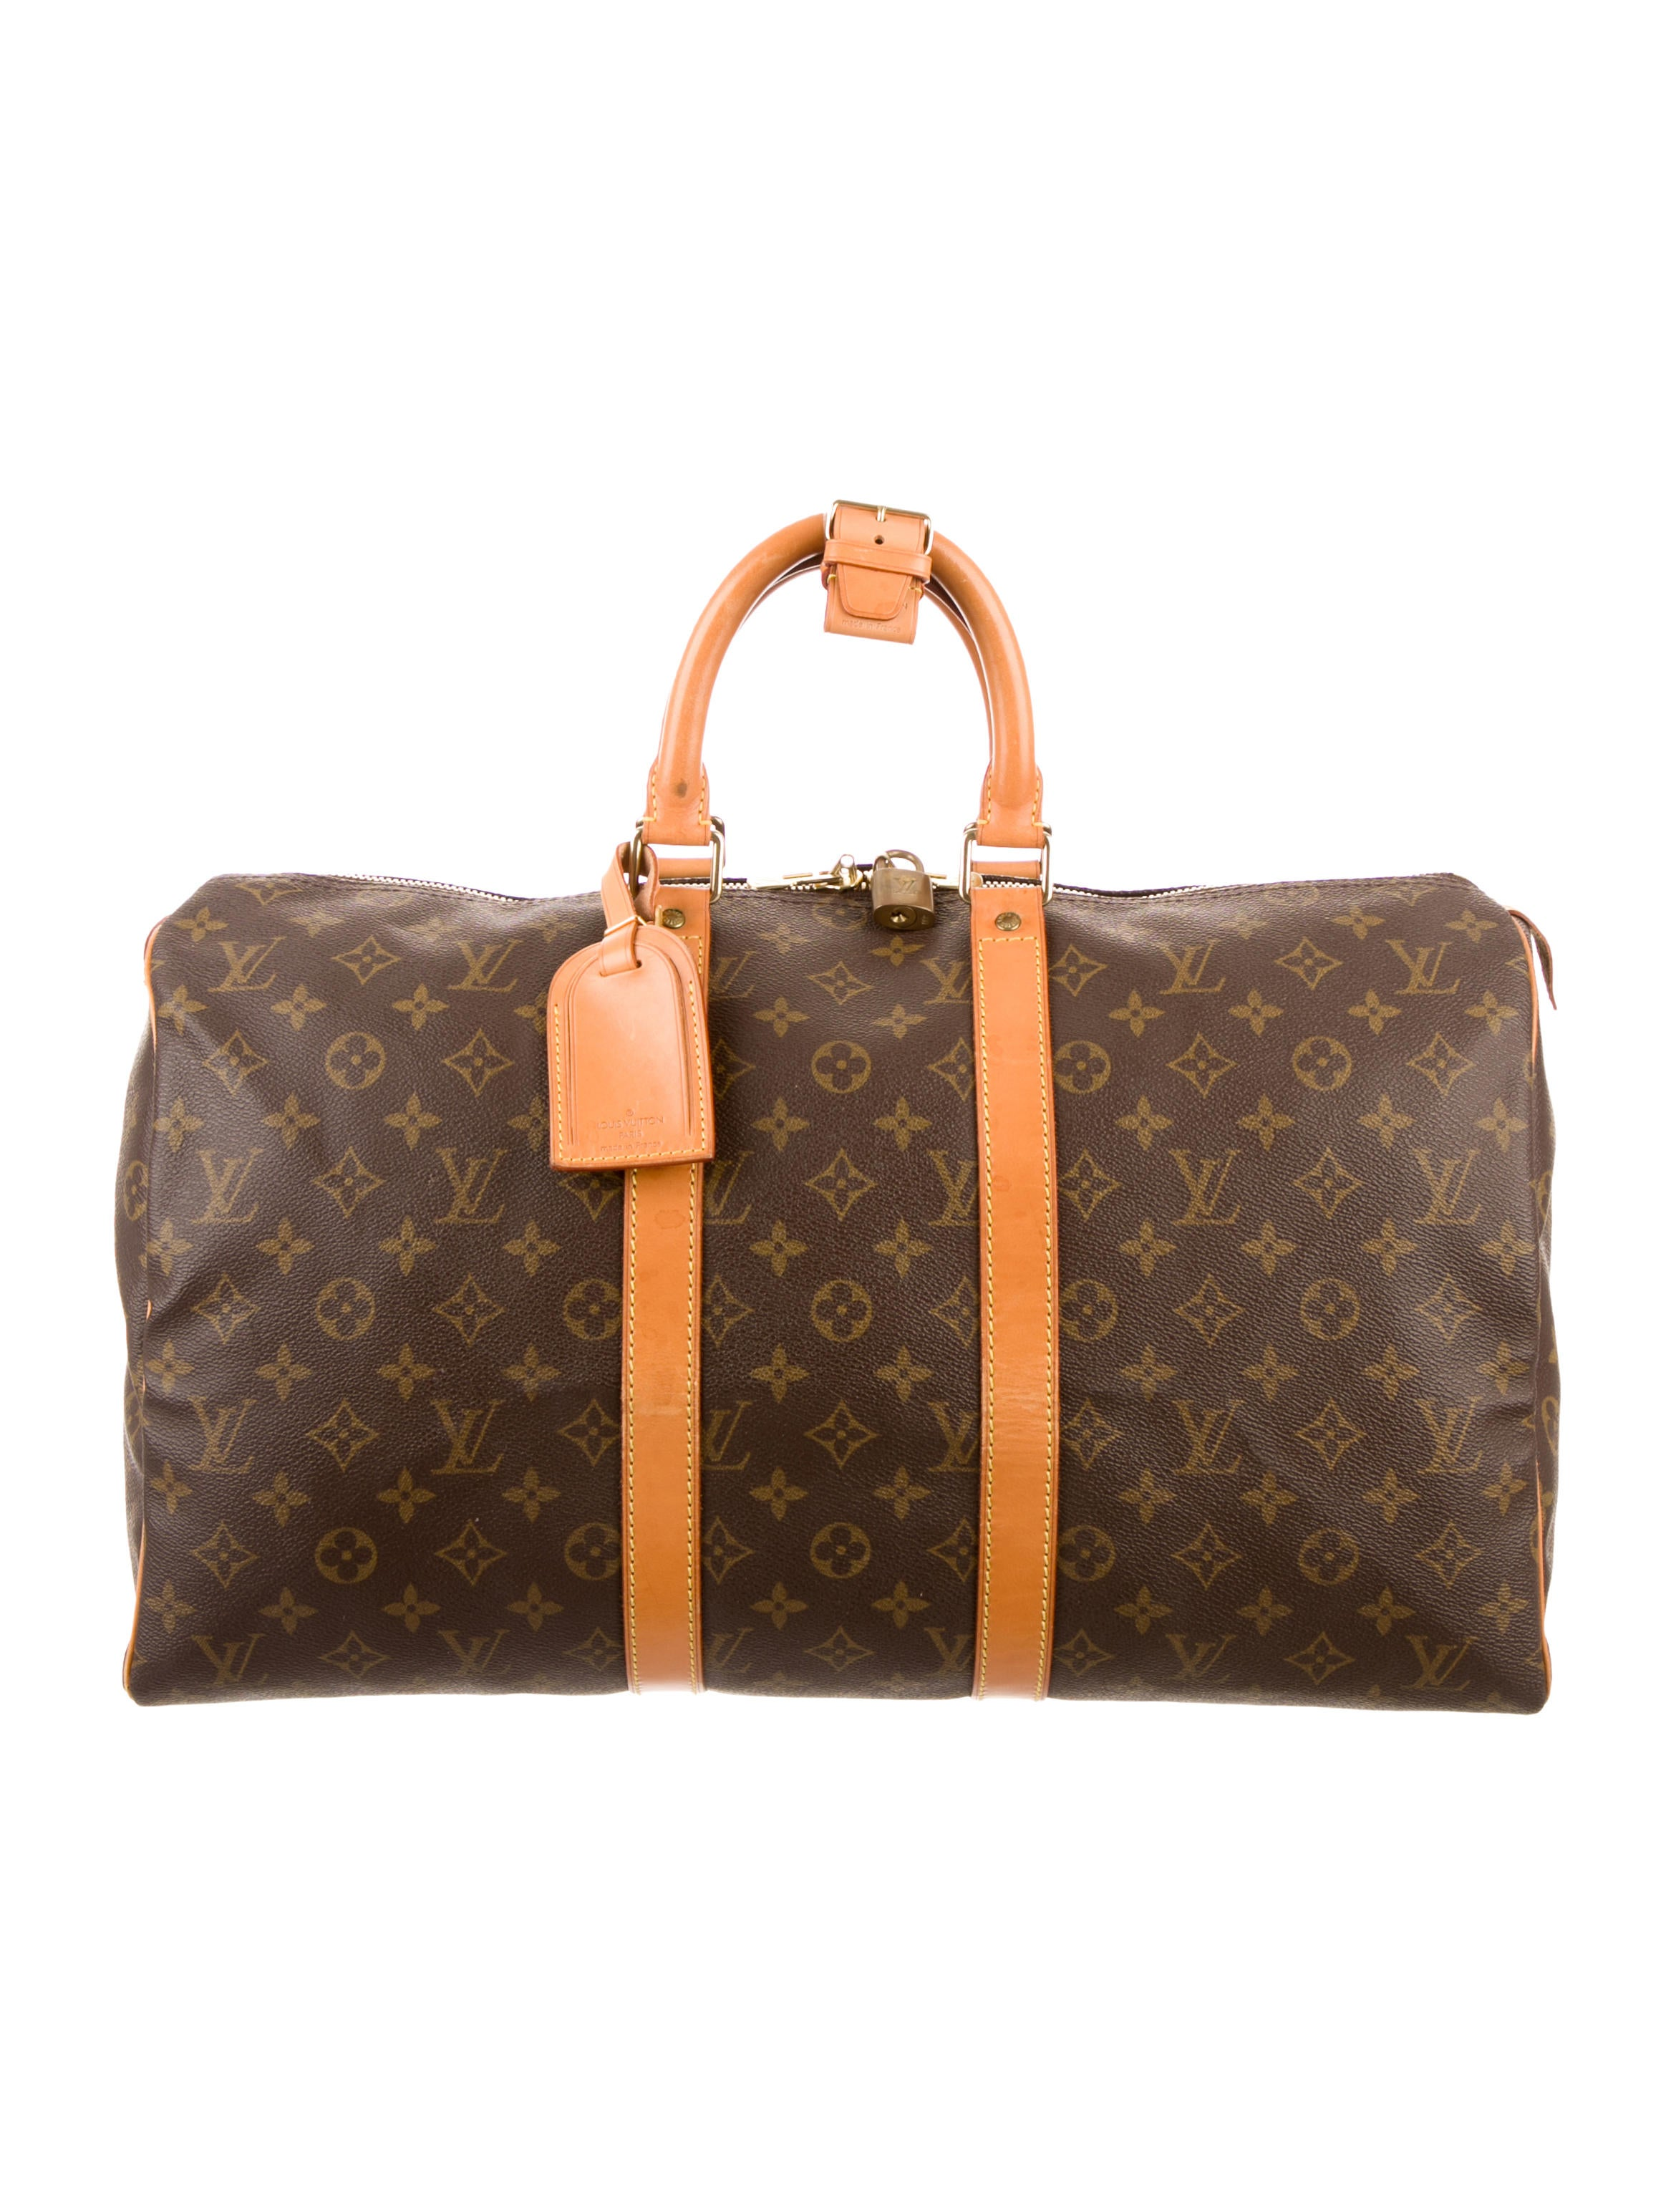 Louis Vuitton Monogram Keepall 45 - Handbags - LOU65304